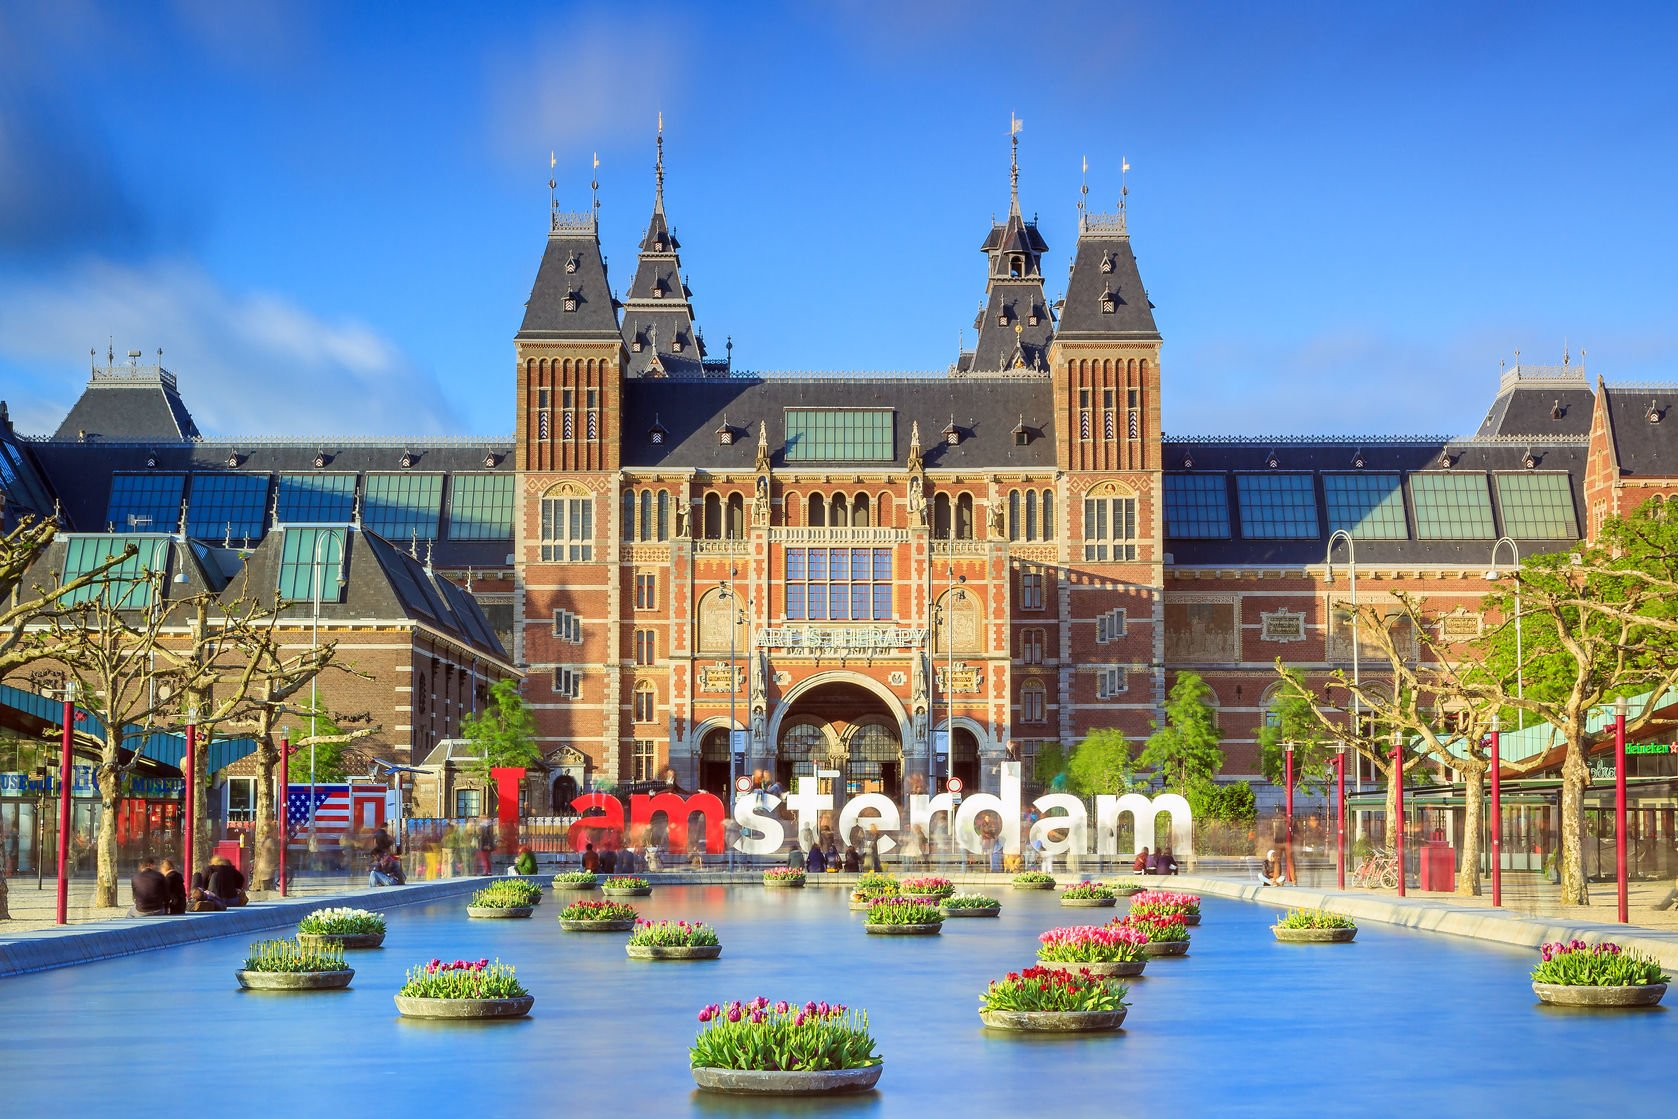 Rijksmuseum v Amsterdamu | dennisvdwater/123RF.com